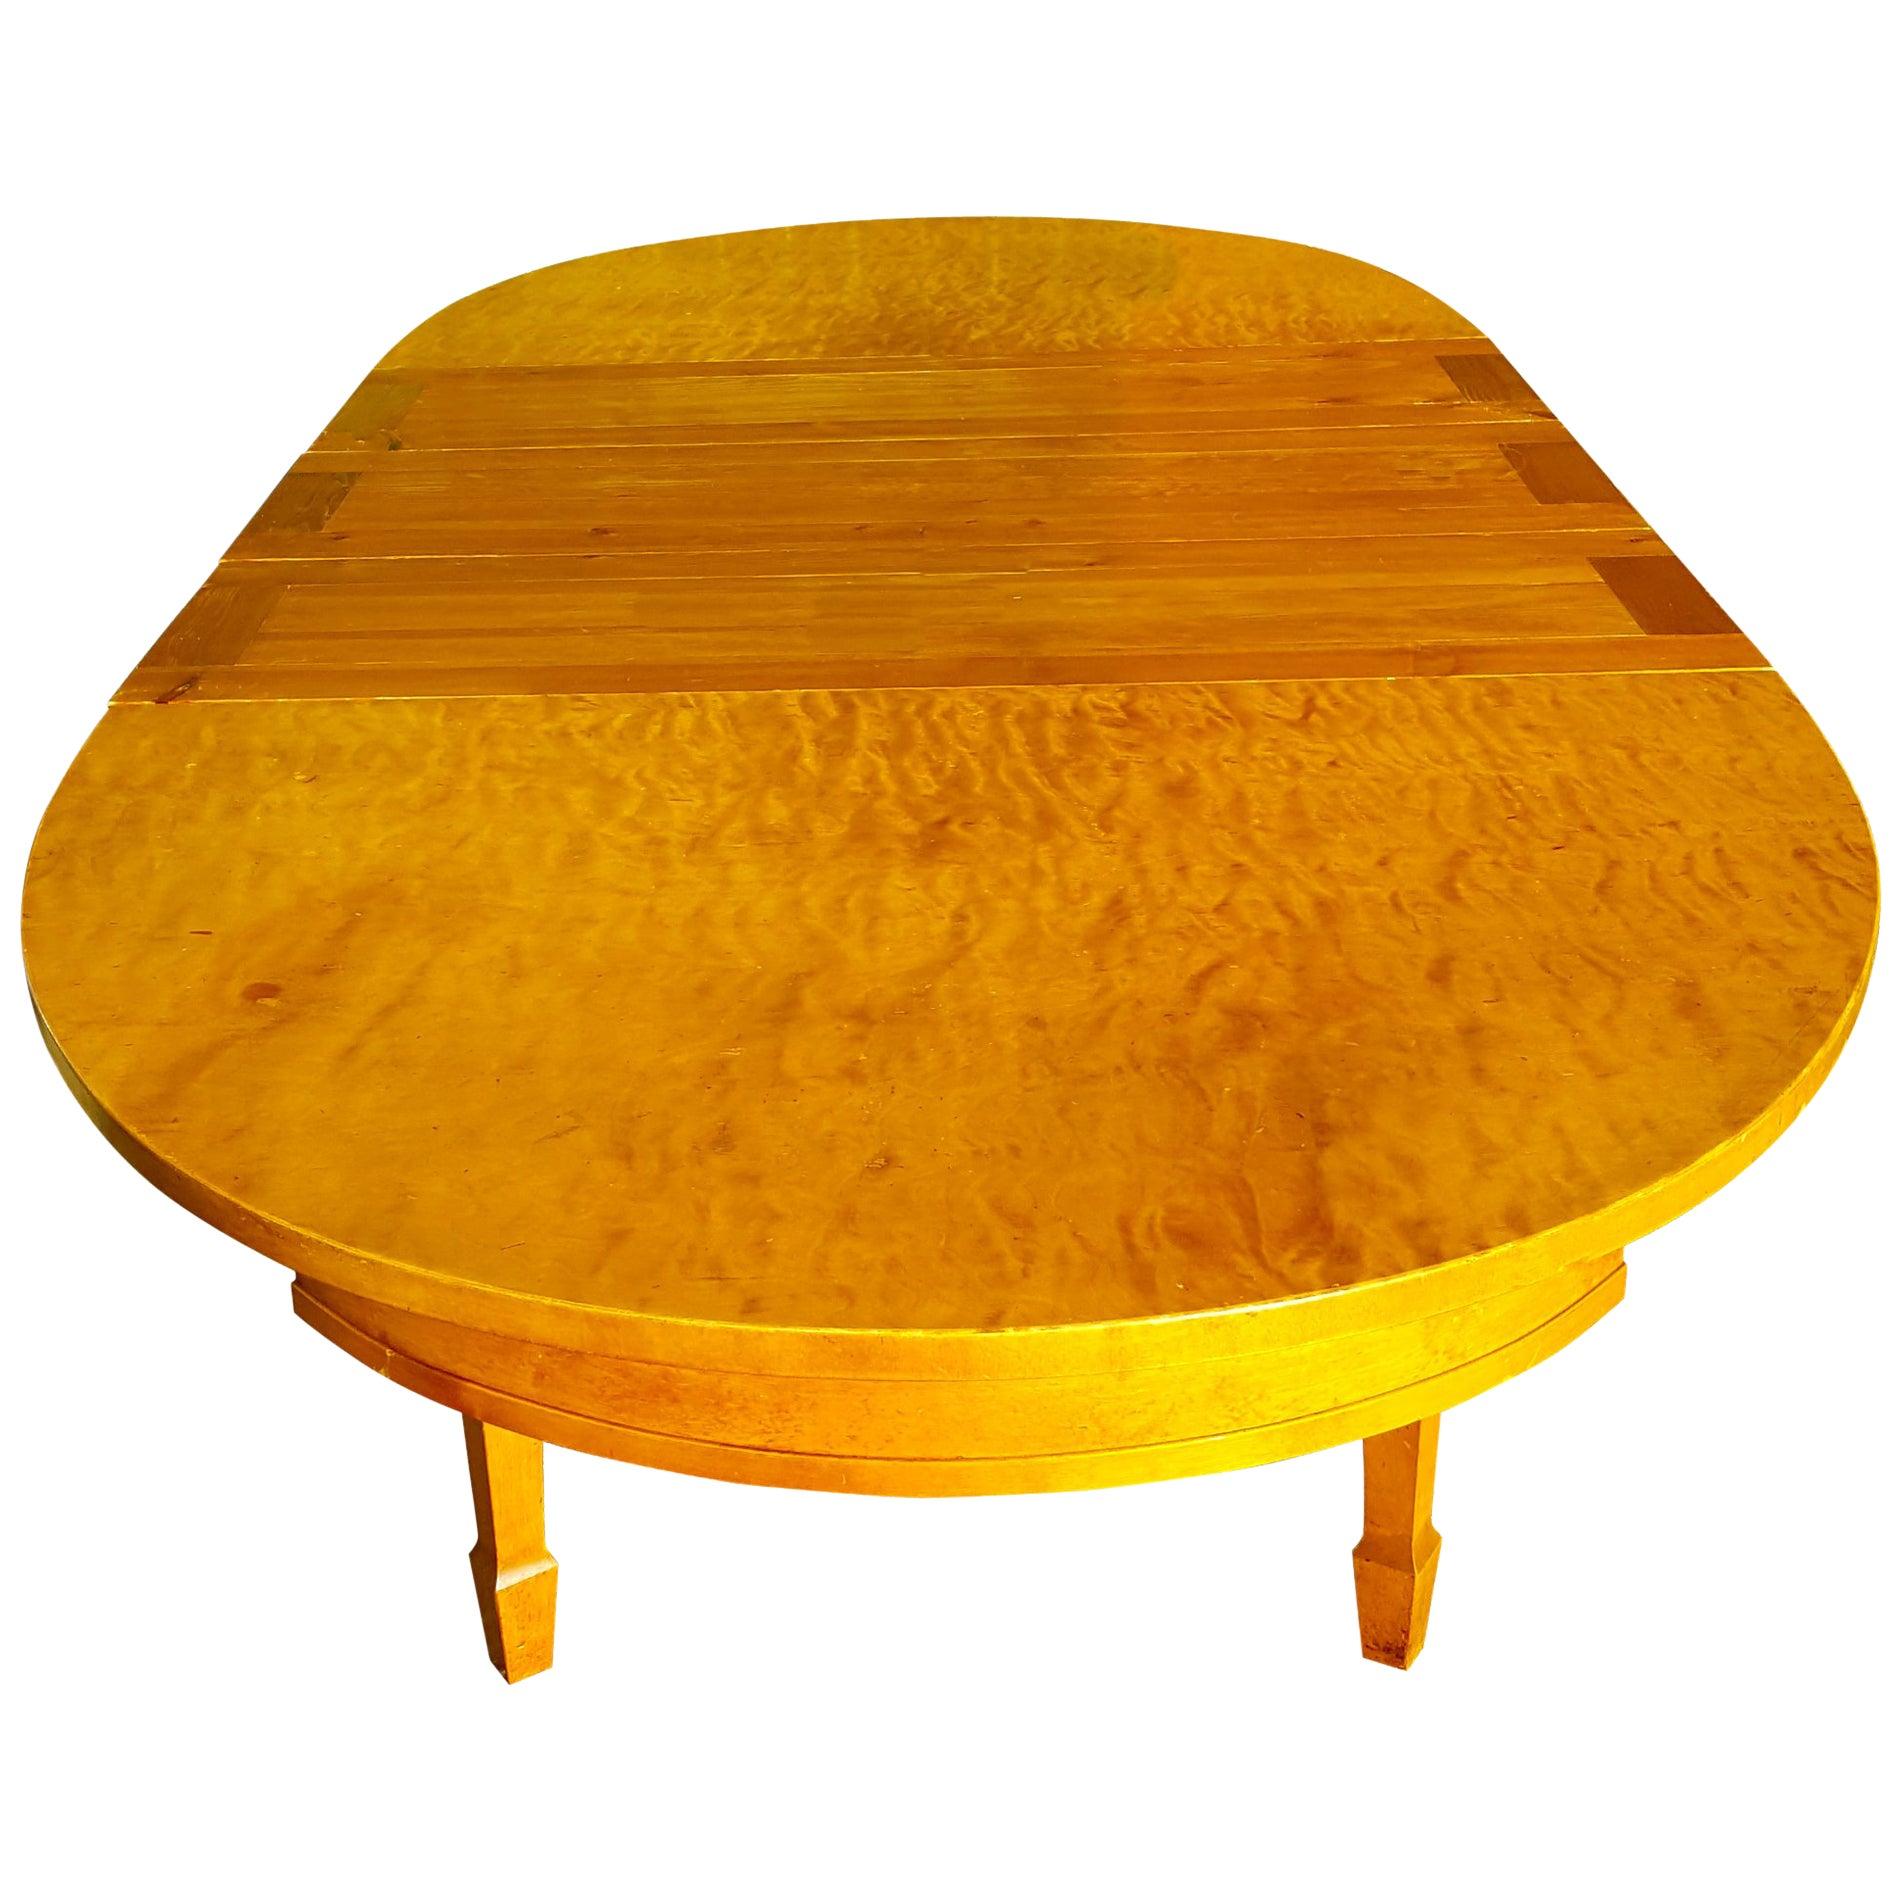 Biedermeier Swedish Extendable Dining Table, Early 20th Century, Art Deco